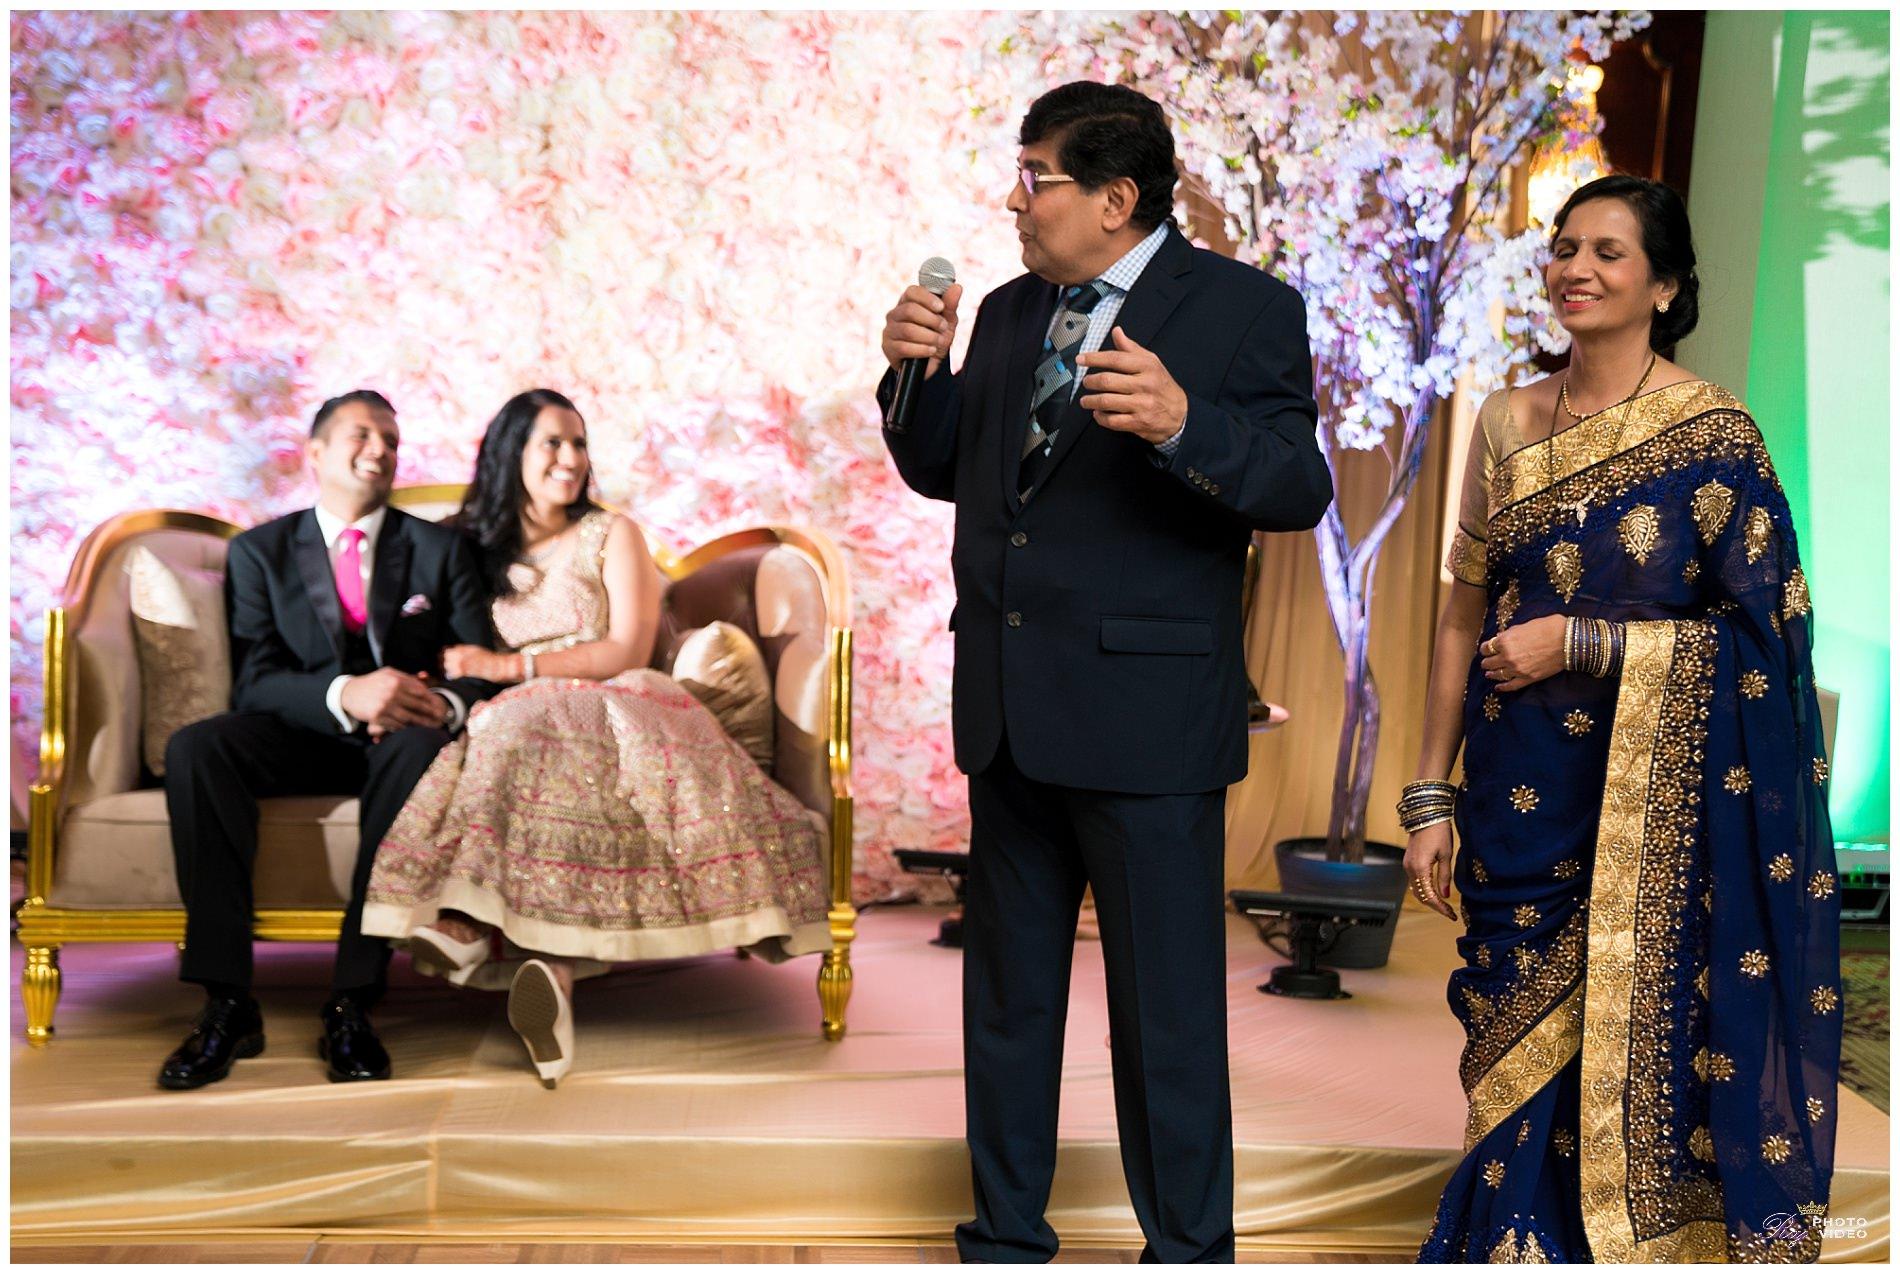 Martinsville-Gardens-NJ-Indian-Wedding-Ruchi-Vishal-60.jpg